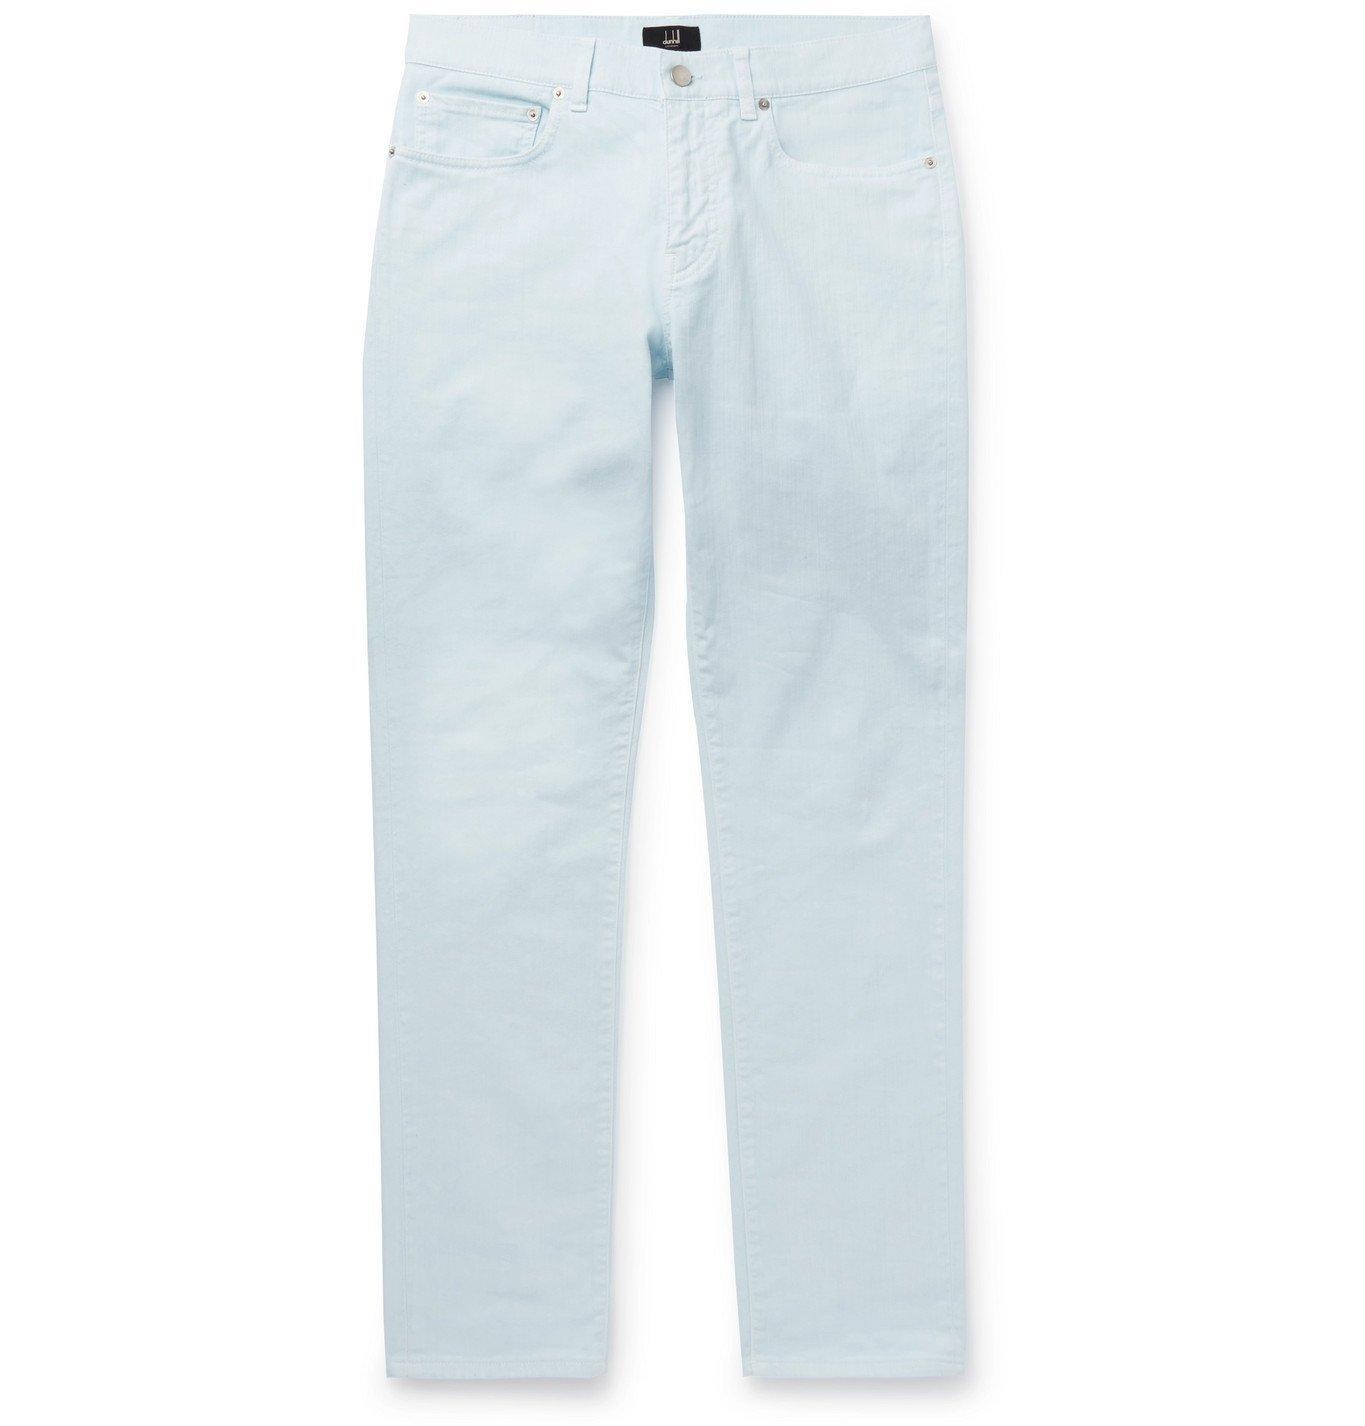 Dunhill - Slim-Fit Denim Jeans - Blue